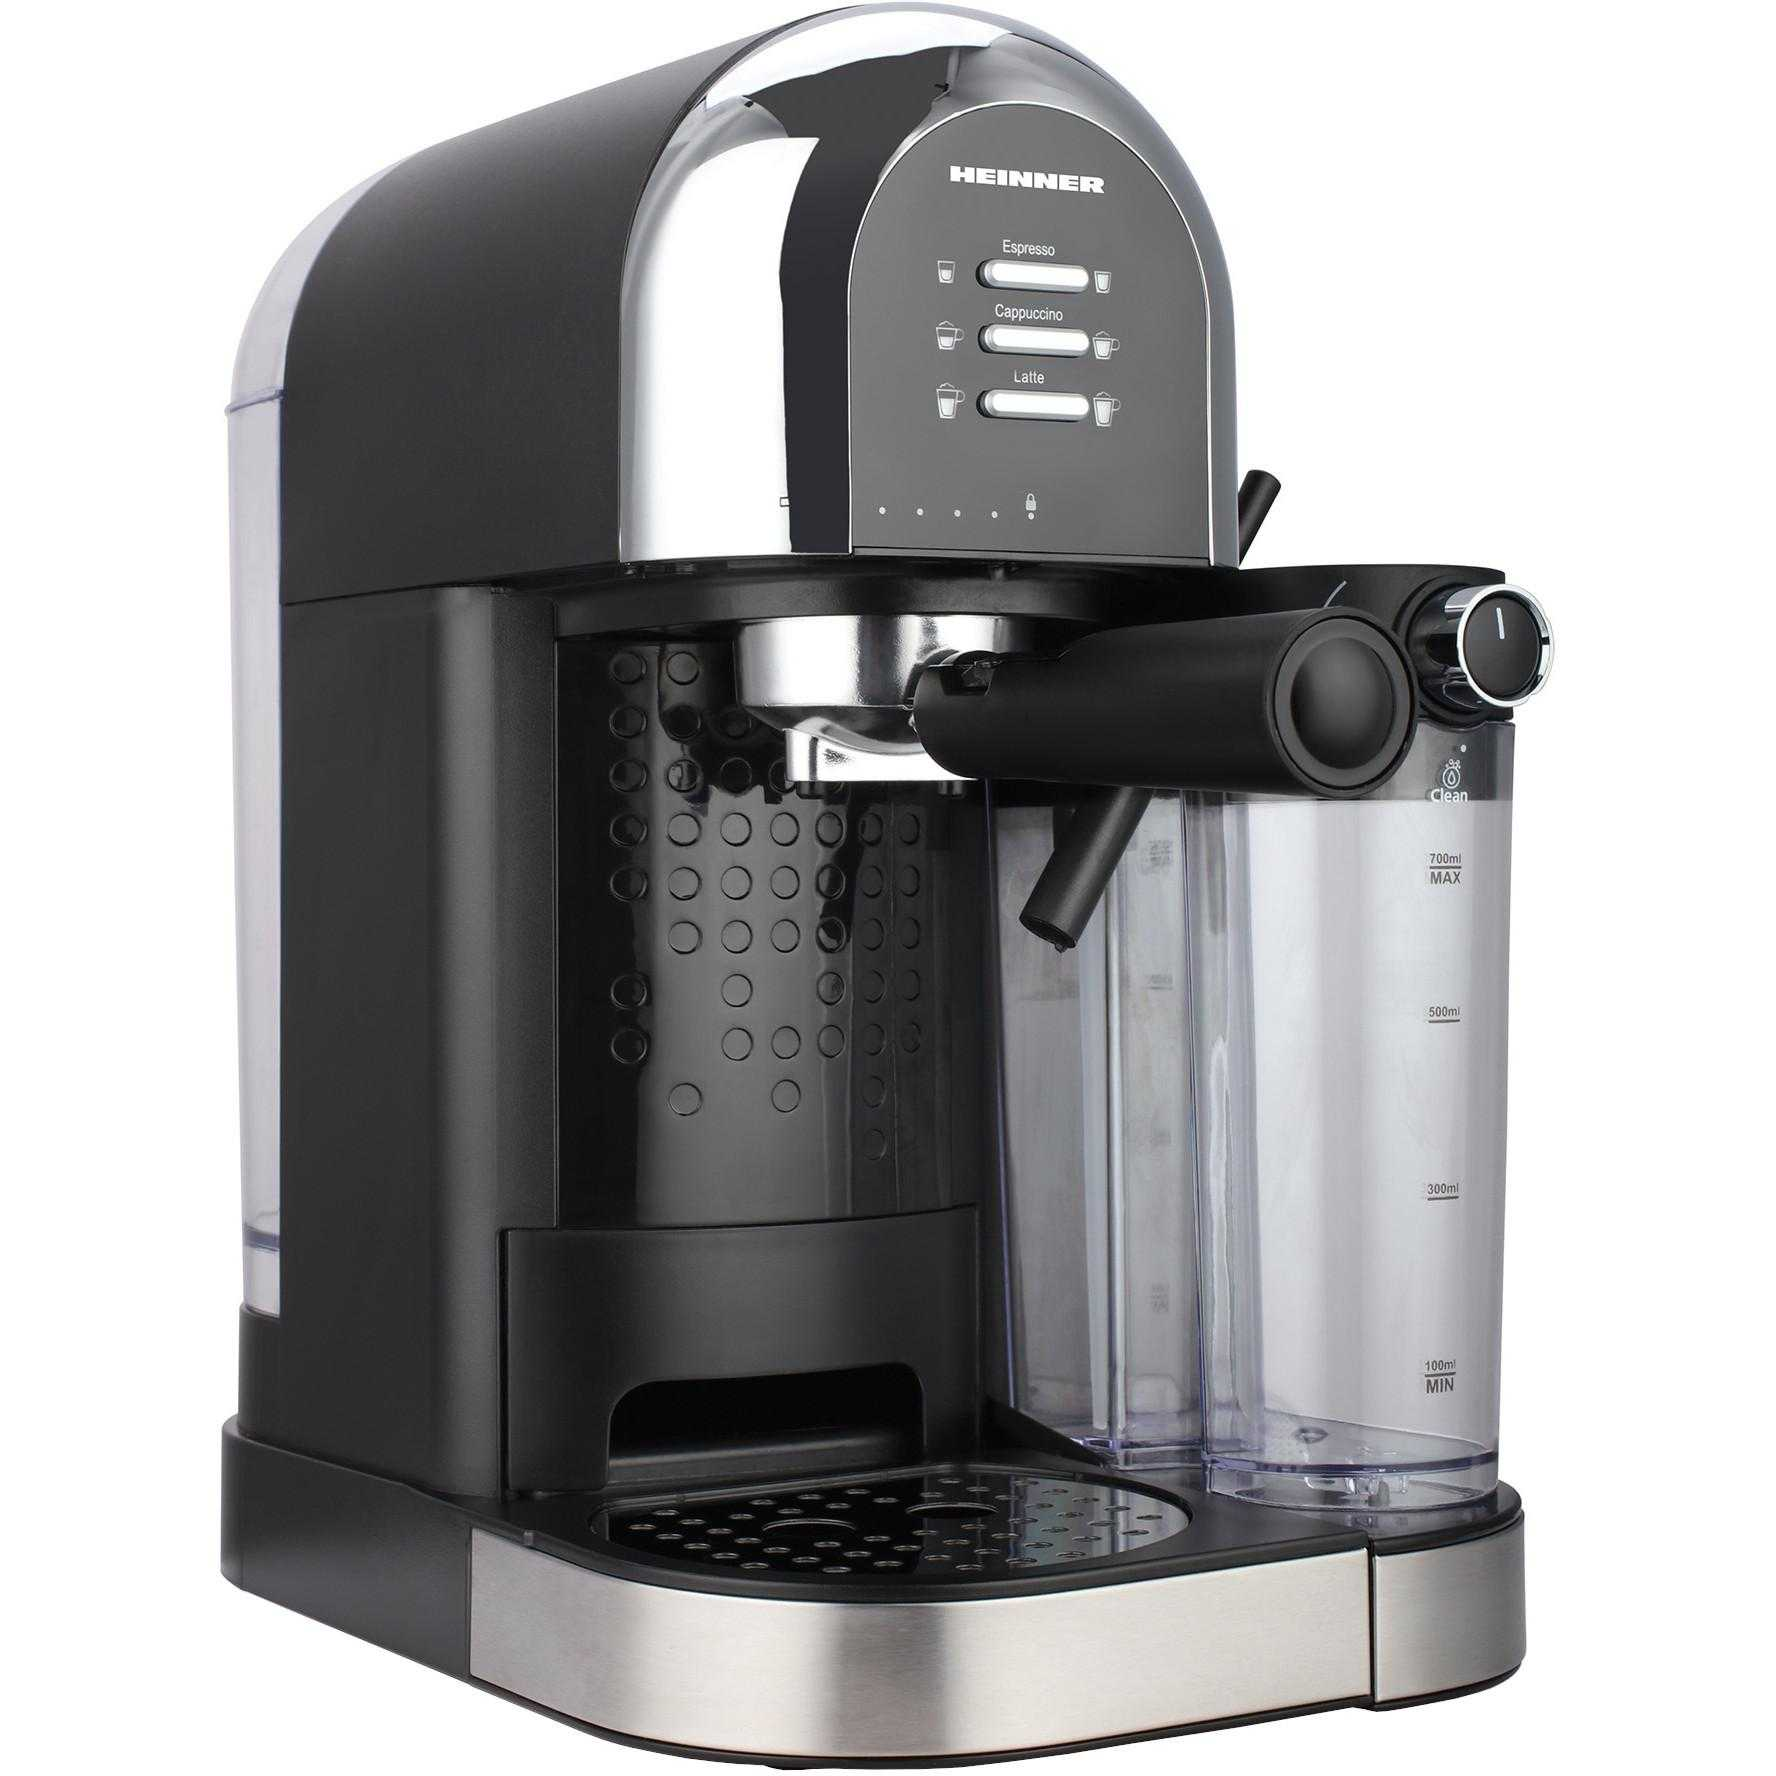 Espressor Manual Heinner Coffee Dreamer Hem-dl1470bk, 1470 W, 1.7 L, 20 Bar, Negru